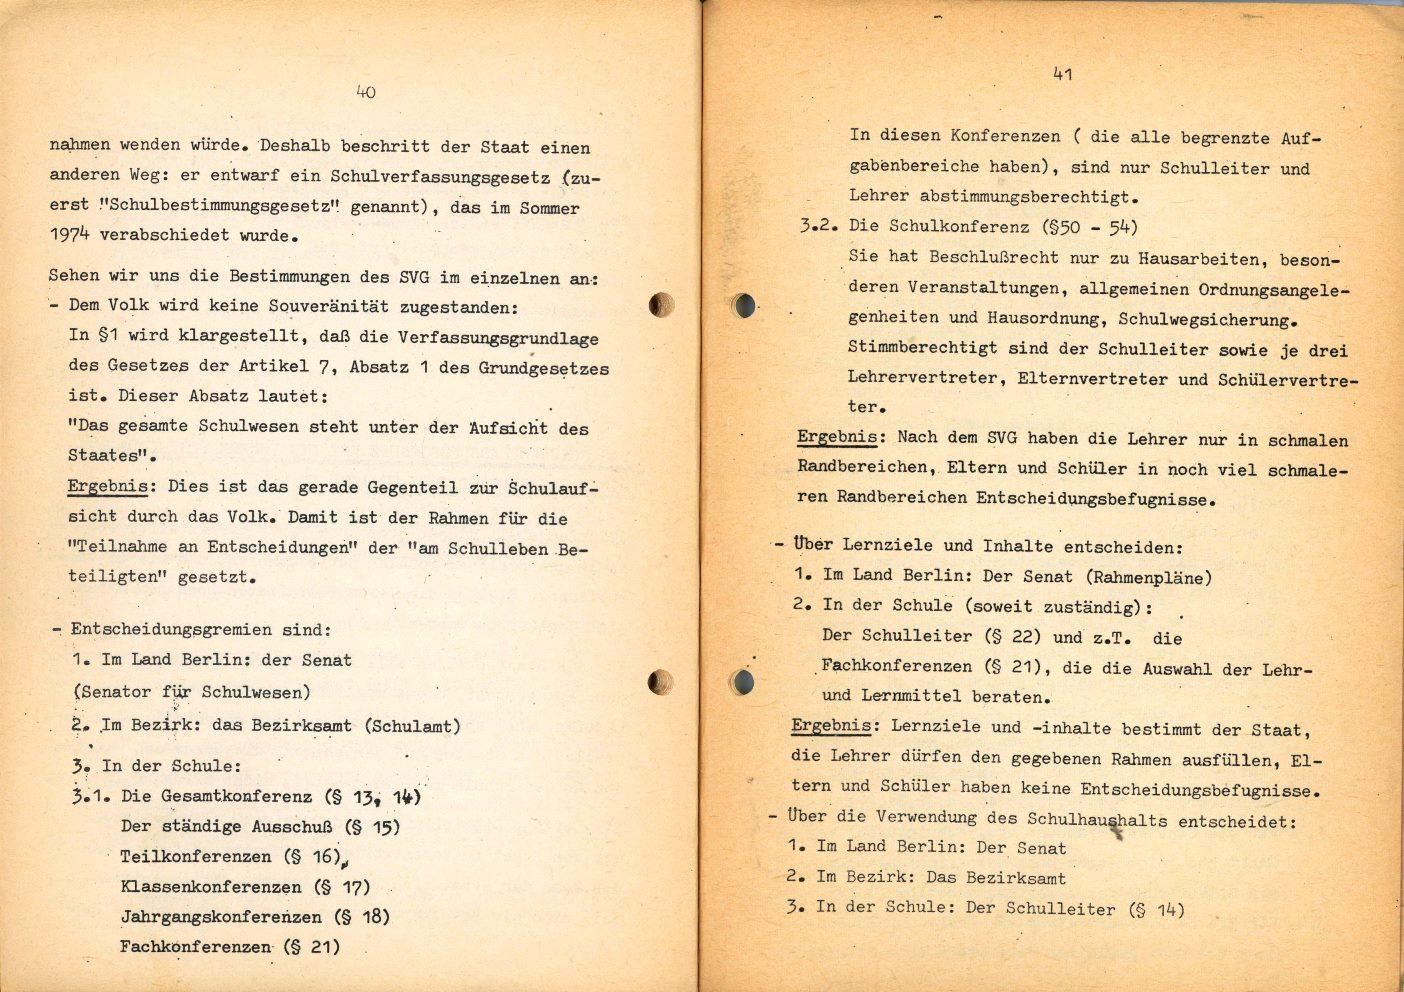 Berlin_SMV_GUV_1974_Schulmisere_23